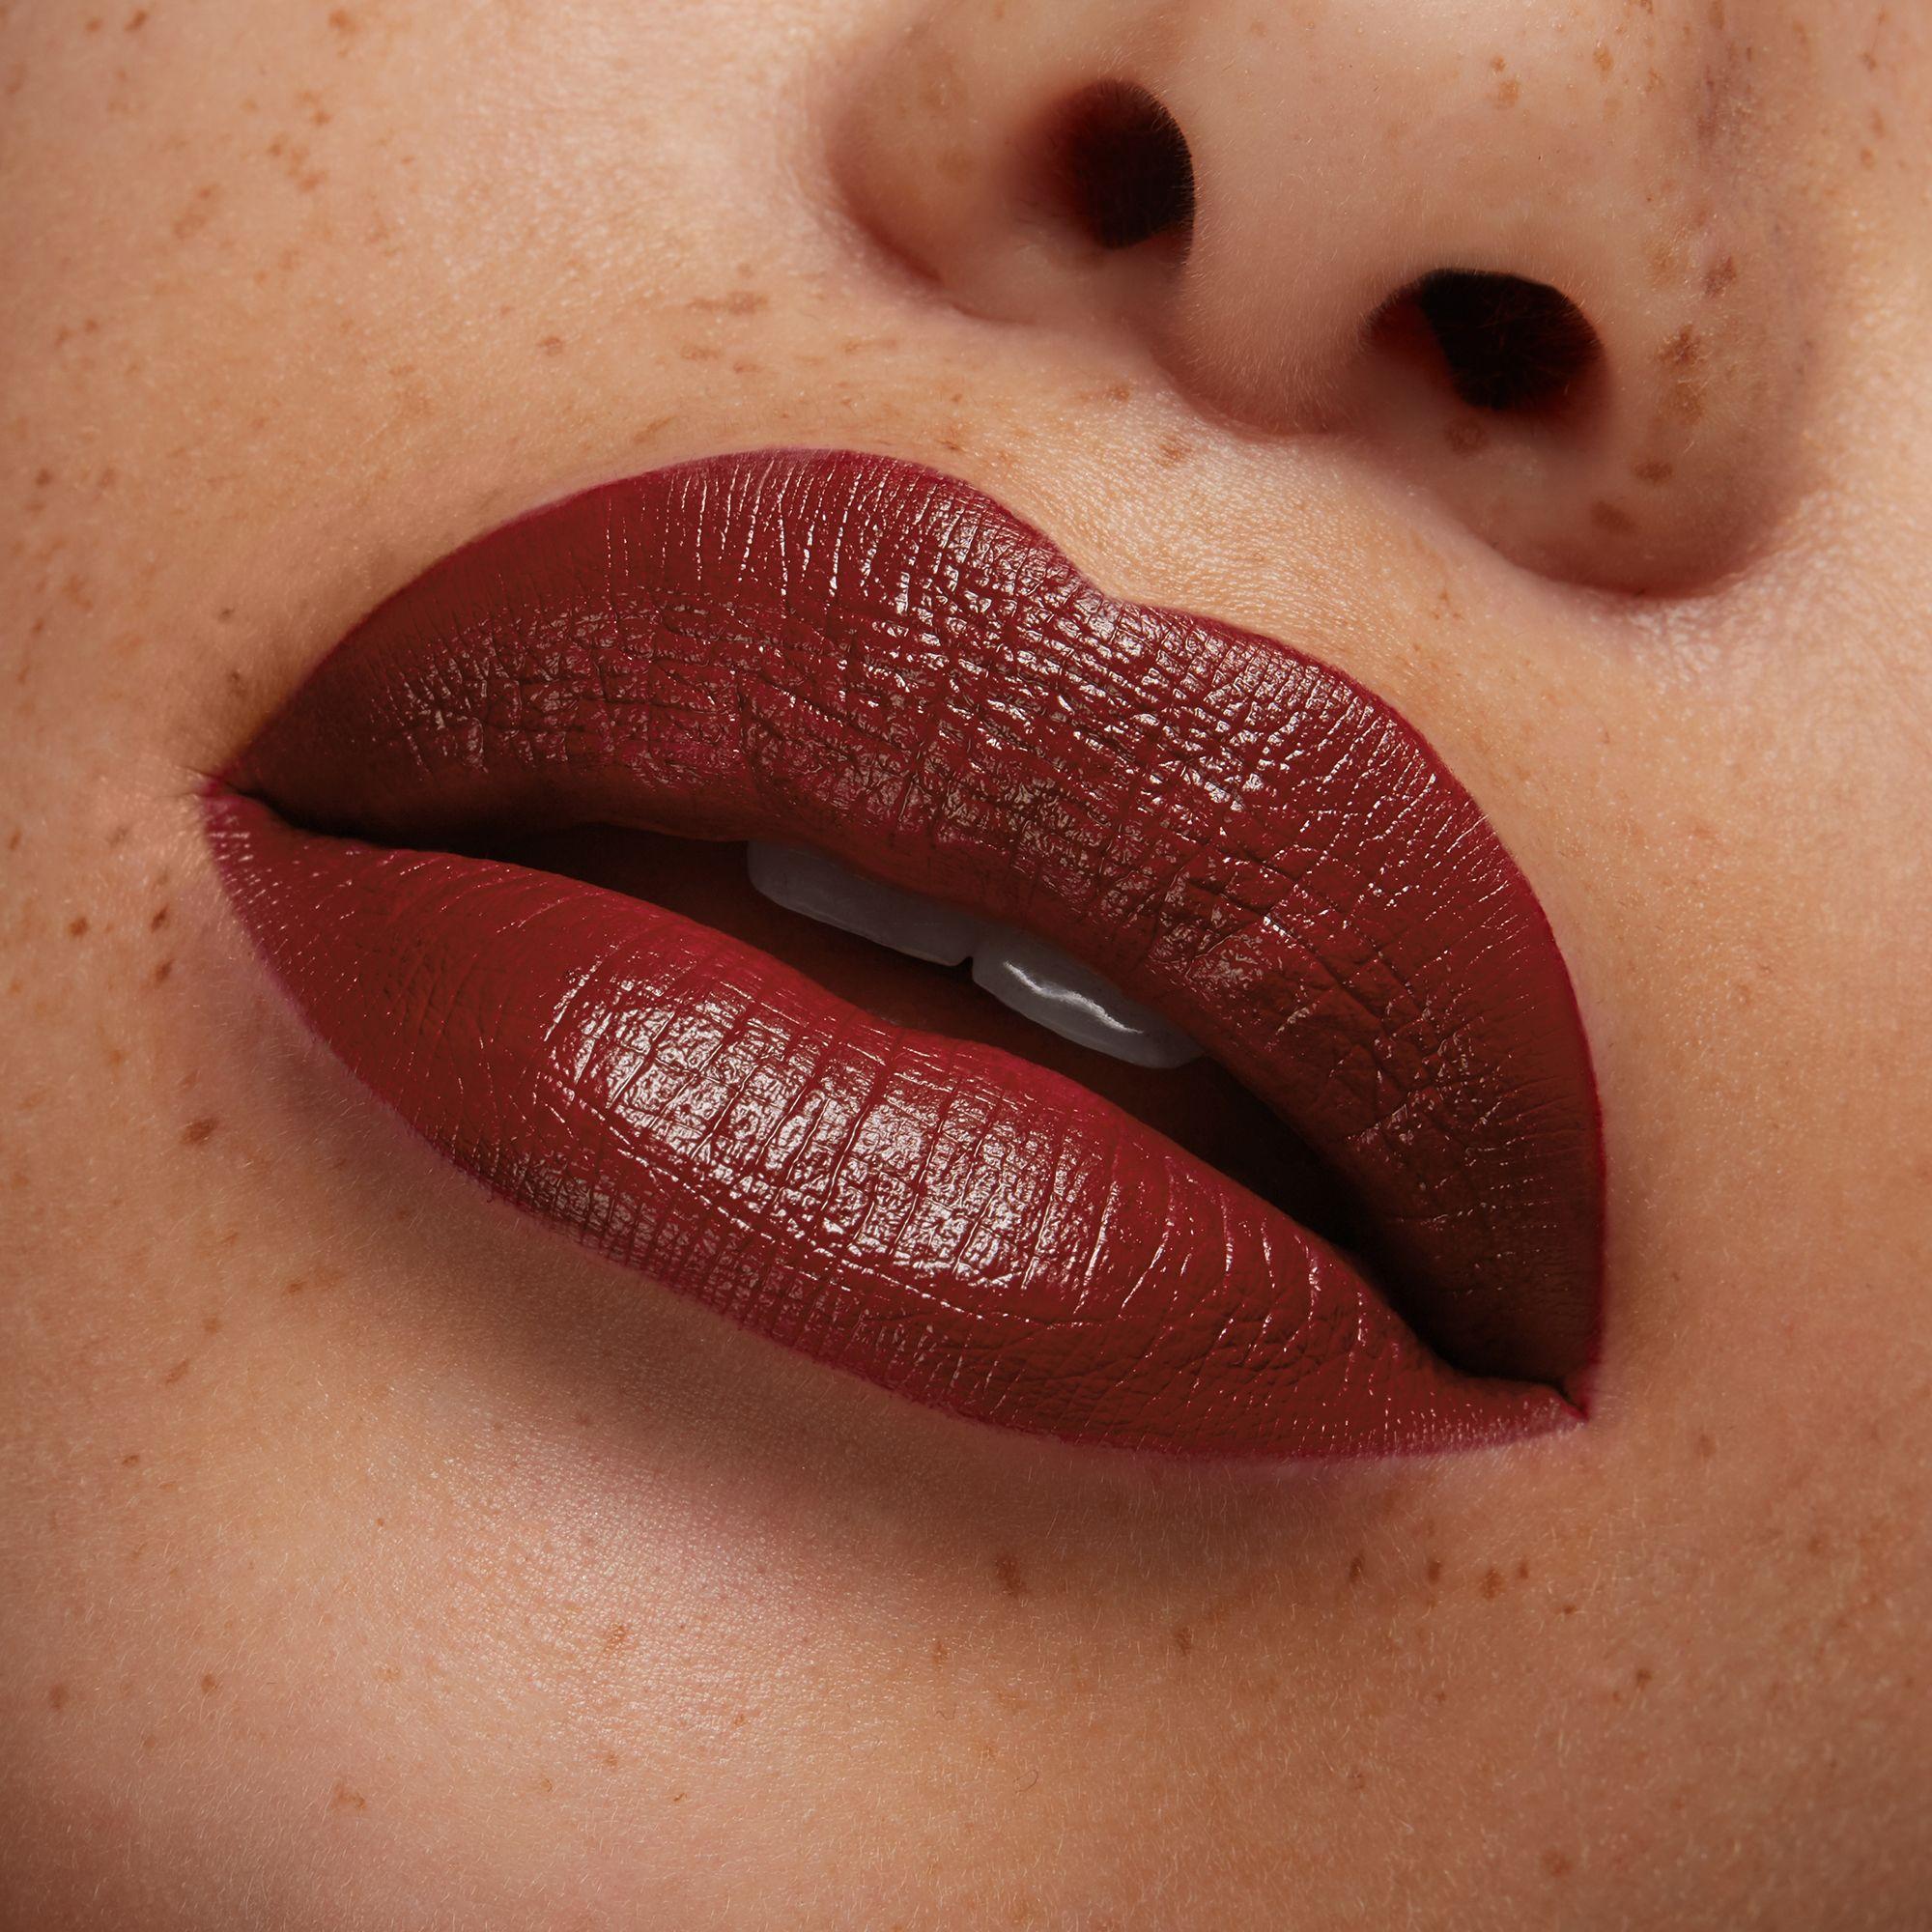 Antimatter lipstick turntable lipstick shade house